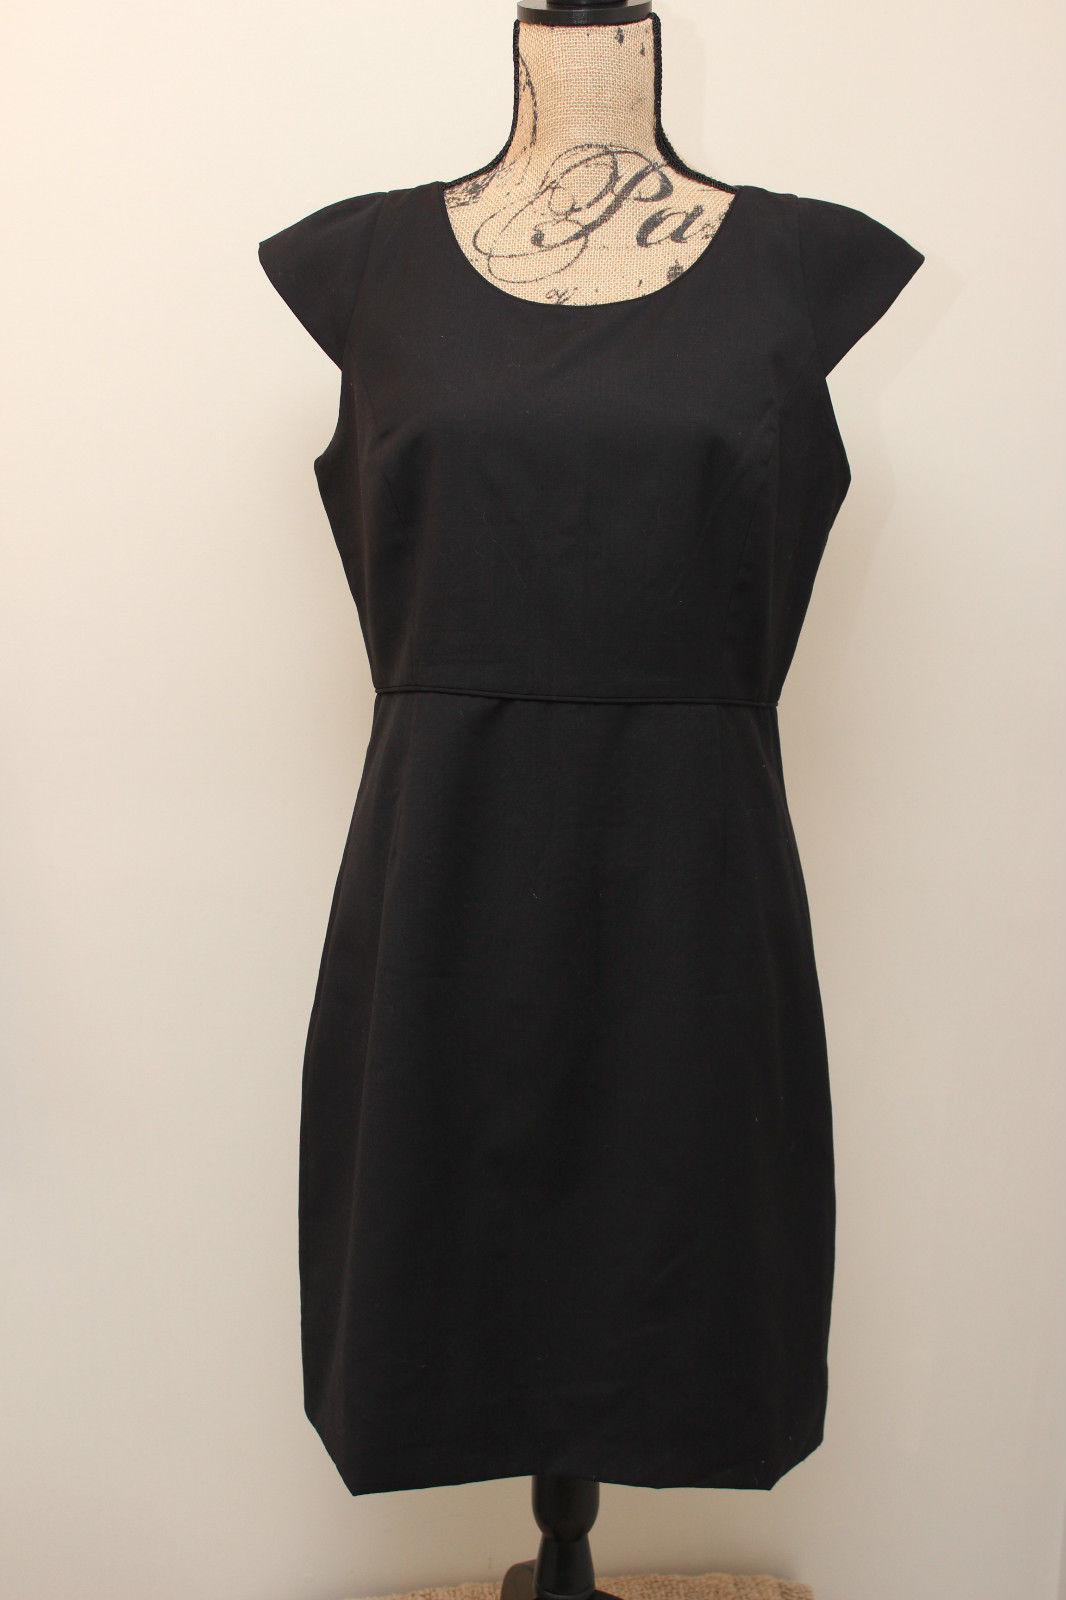 f653367eb1 J Crew Black 100% Wool Suiting Dress Cap and 50 similar items. S l1600